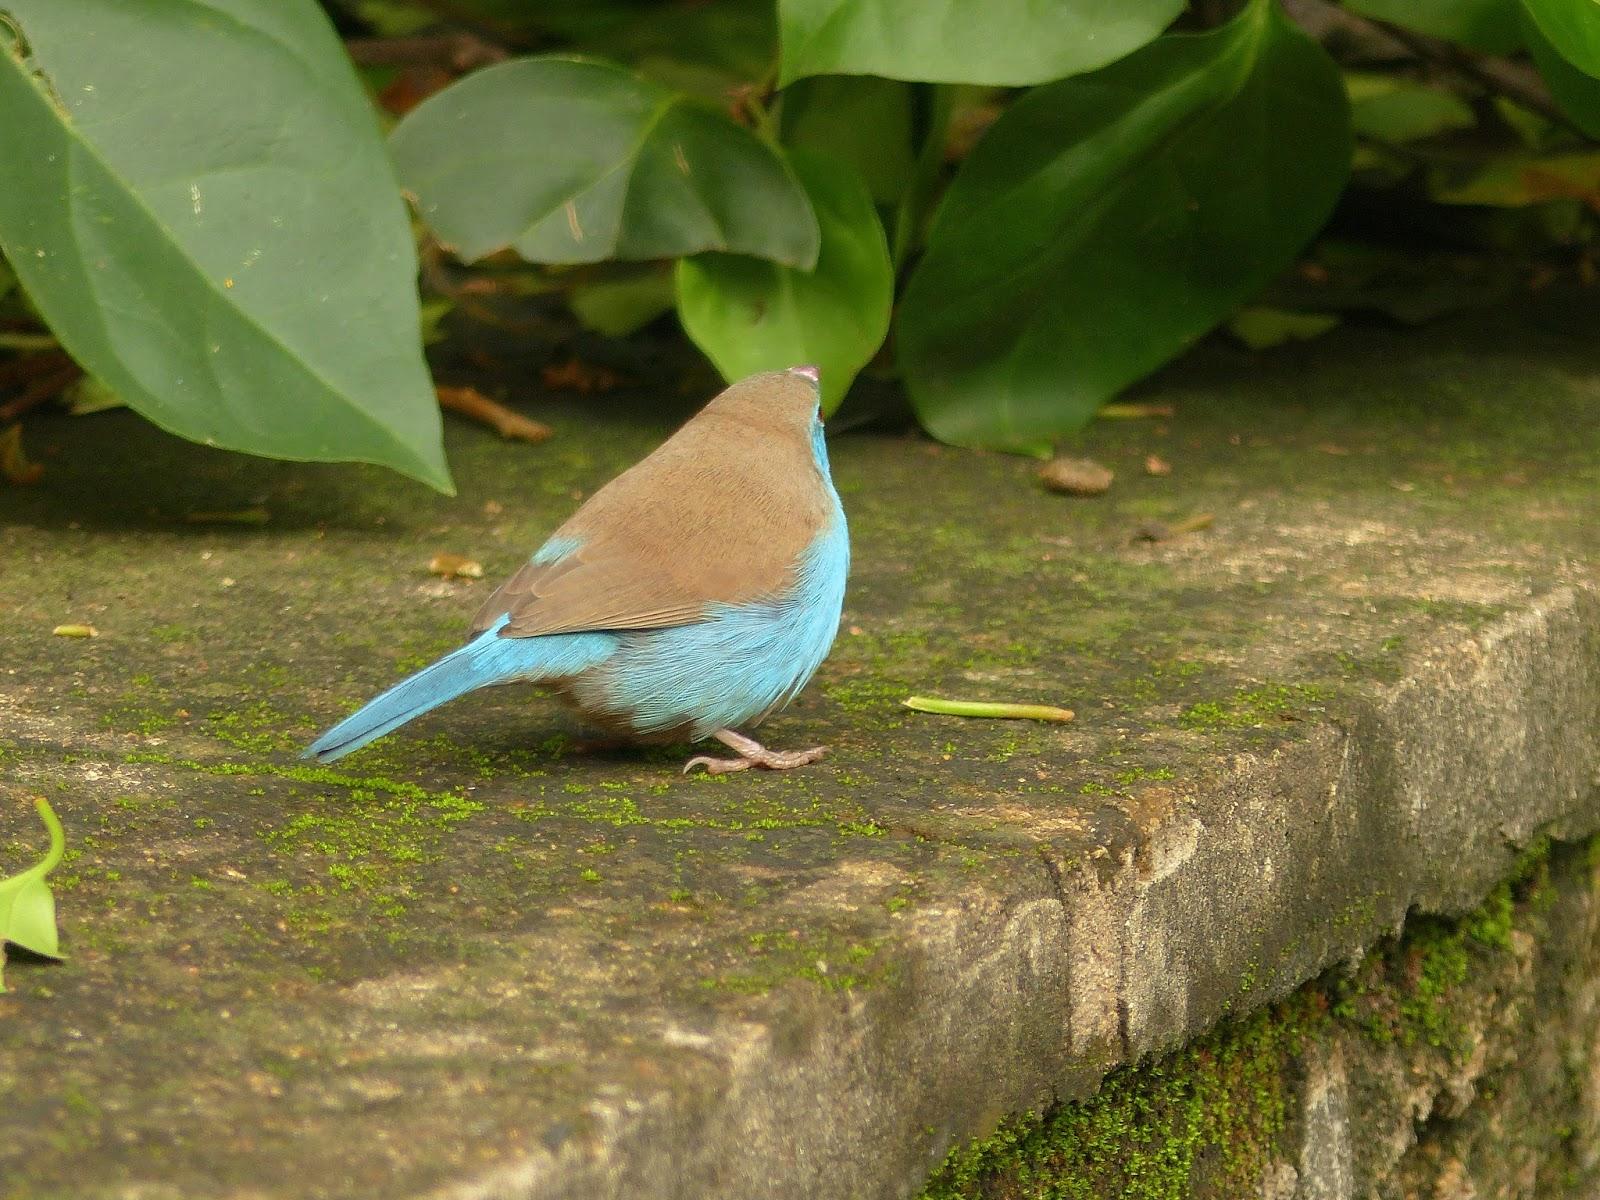 Birding For Pleasure Through My Lens